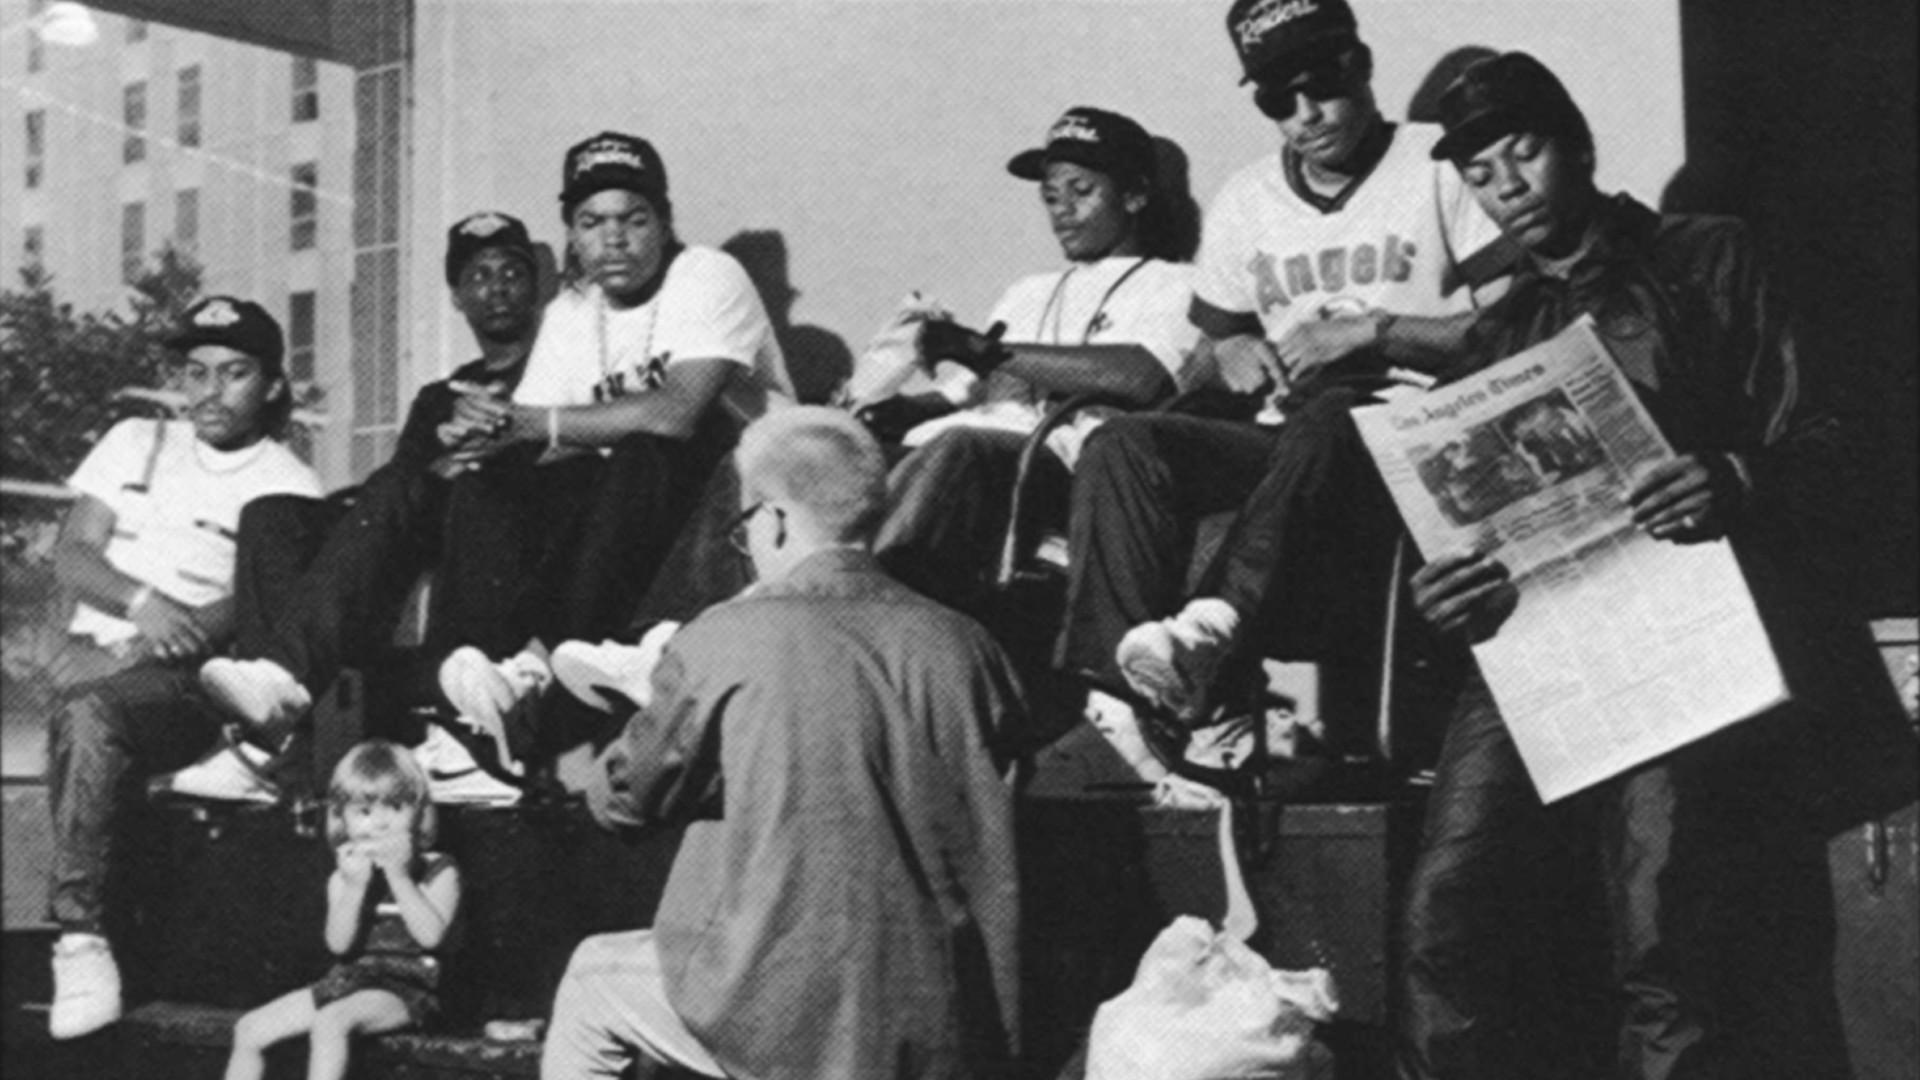 NWA: Eazy-E, Mc REN, Dr DRE, Ice CUbe   Old